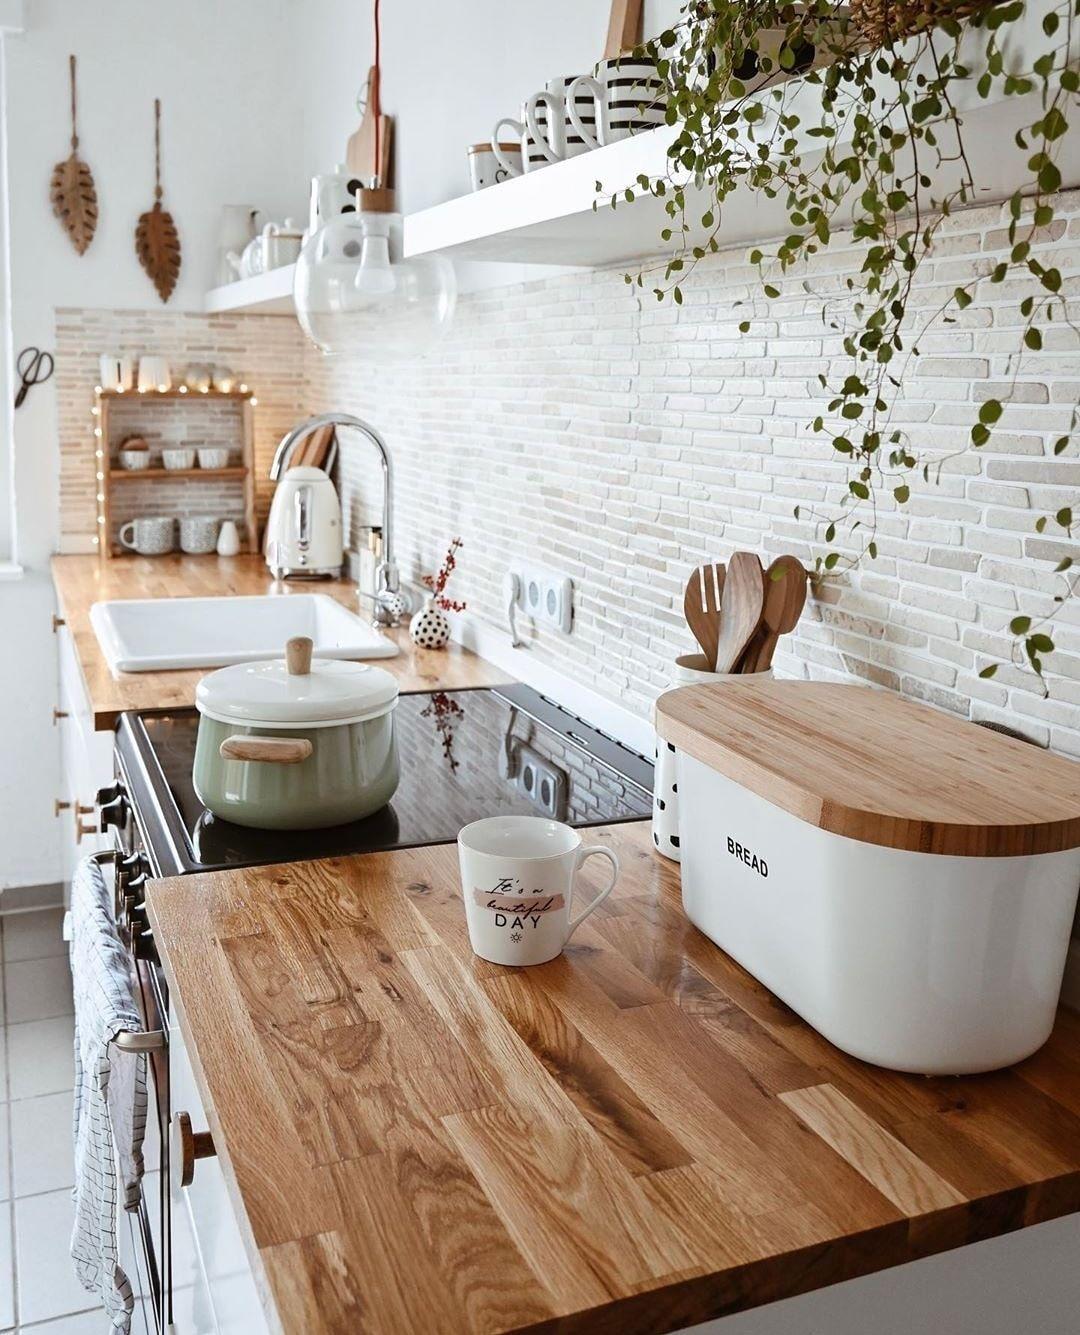 Home Decor Design On Instagram Such A Warm And Cozy Kitchen Style I Cozy Deco Home Decor Kitchen Kitchen Interior House Interior